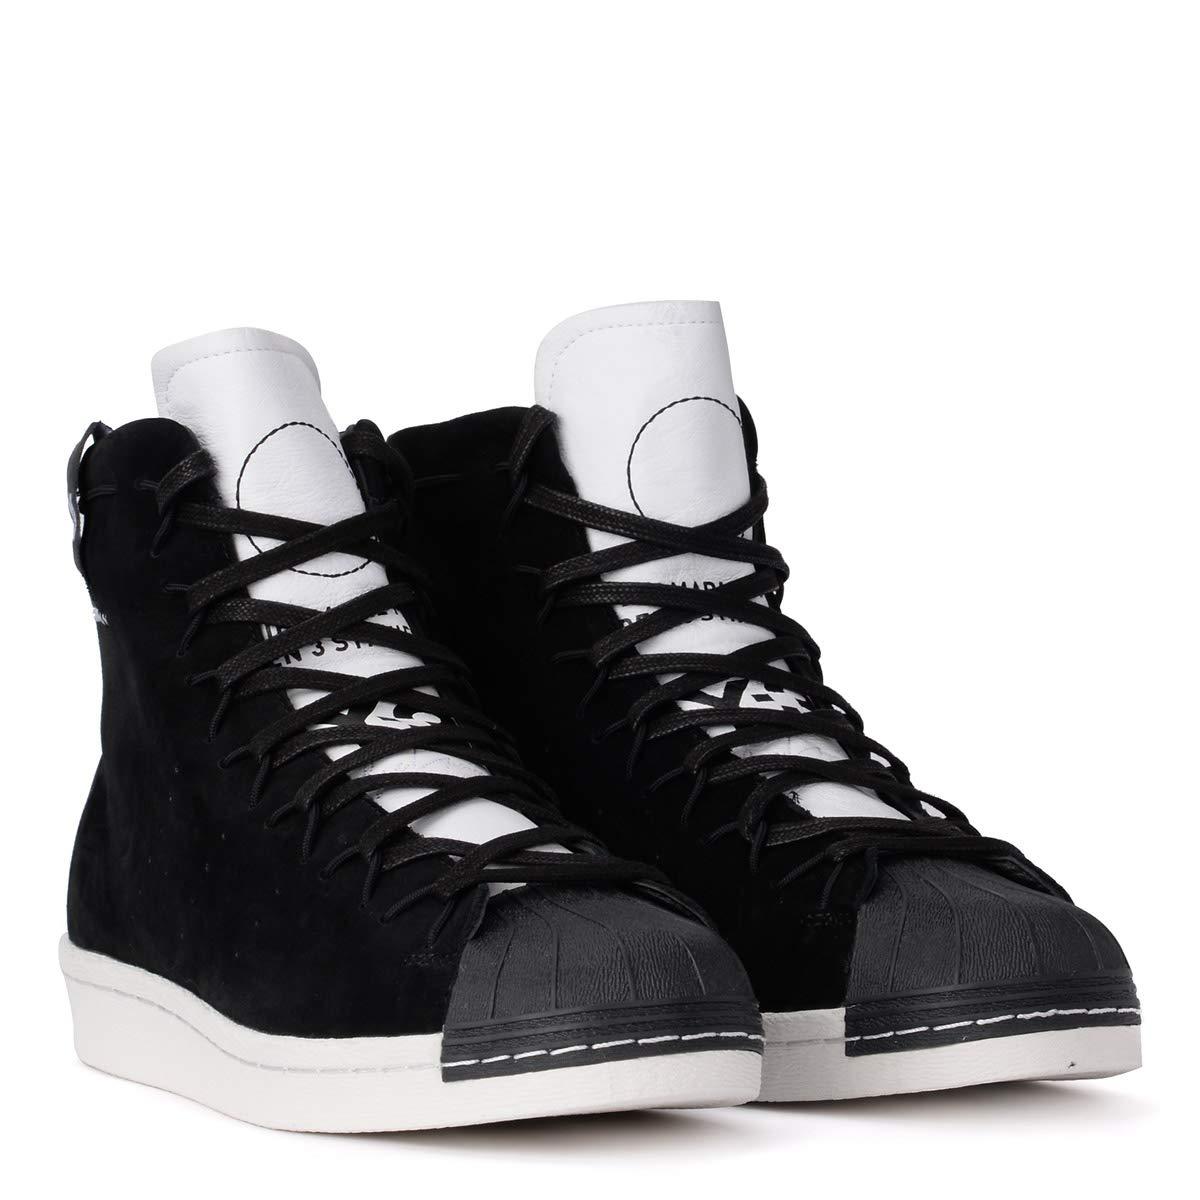 75c1feaf2 Y-3 Men s Sneaker Alta Y-3 Super High in Suede Nero E Pelle Bianca 8(UK)  -8(UK) Multicolour  Amazon.co.uk  Shoes   Bags